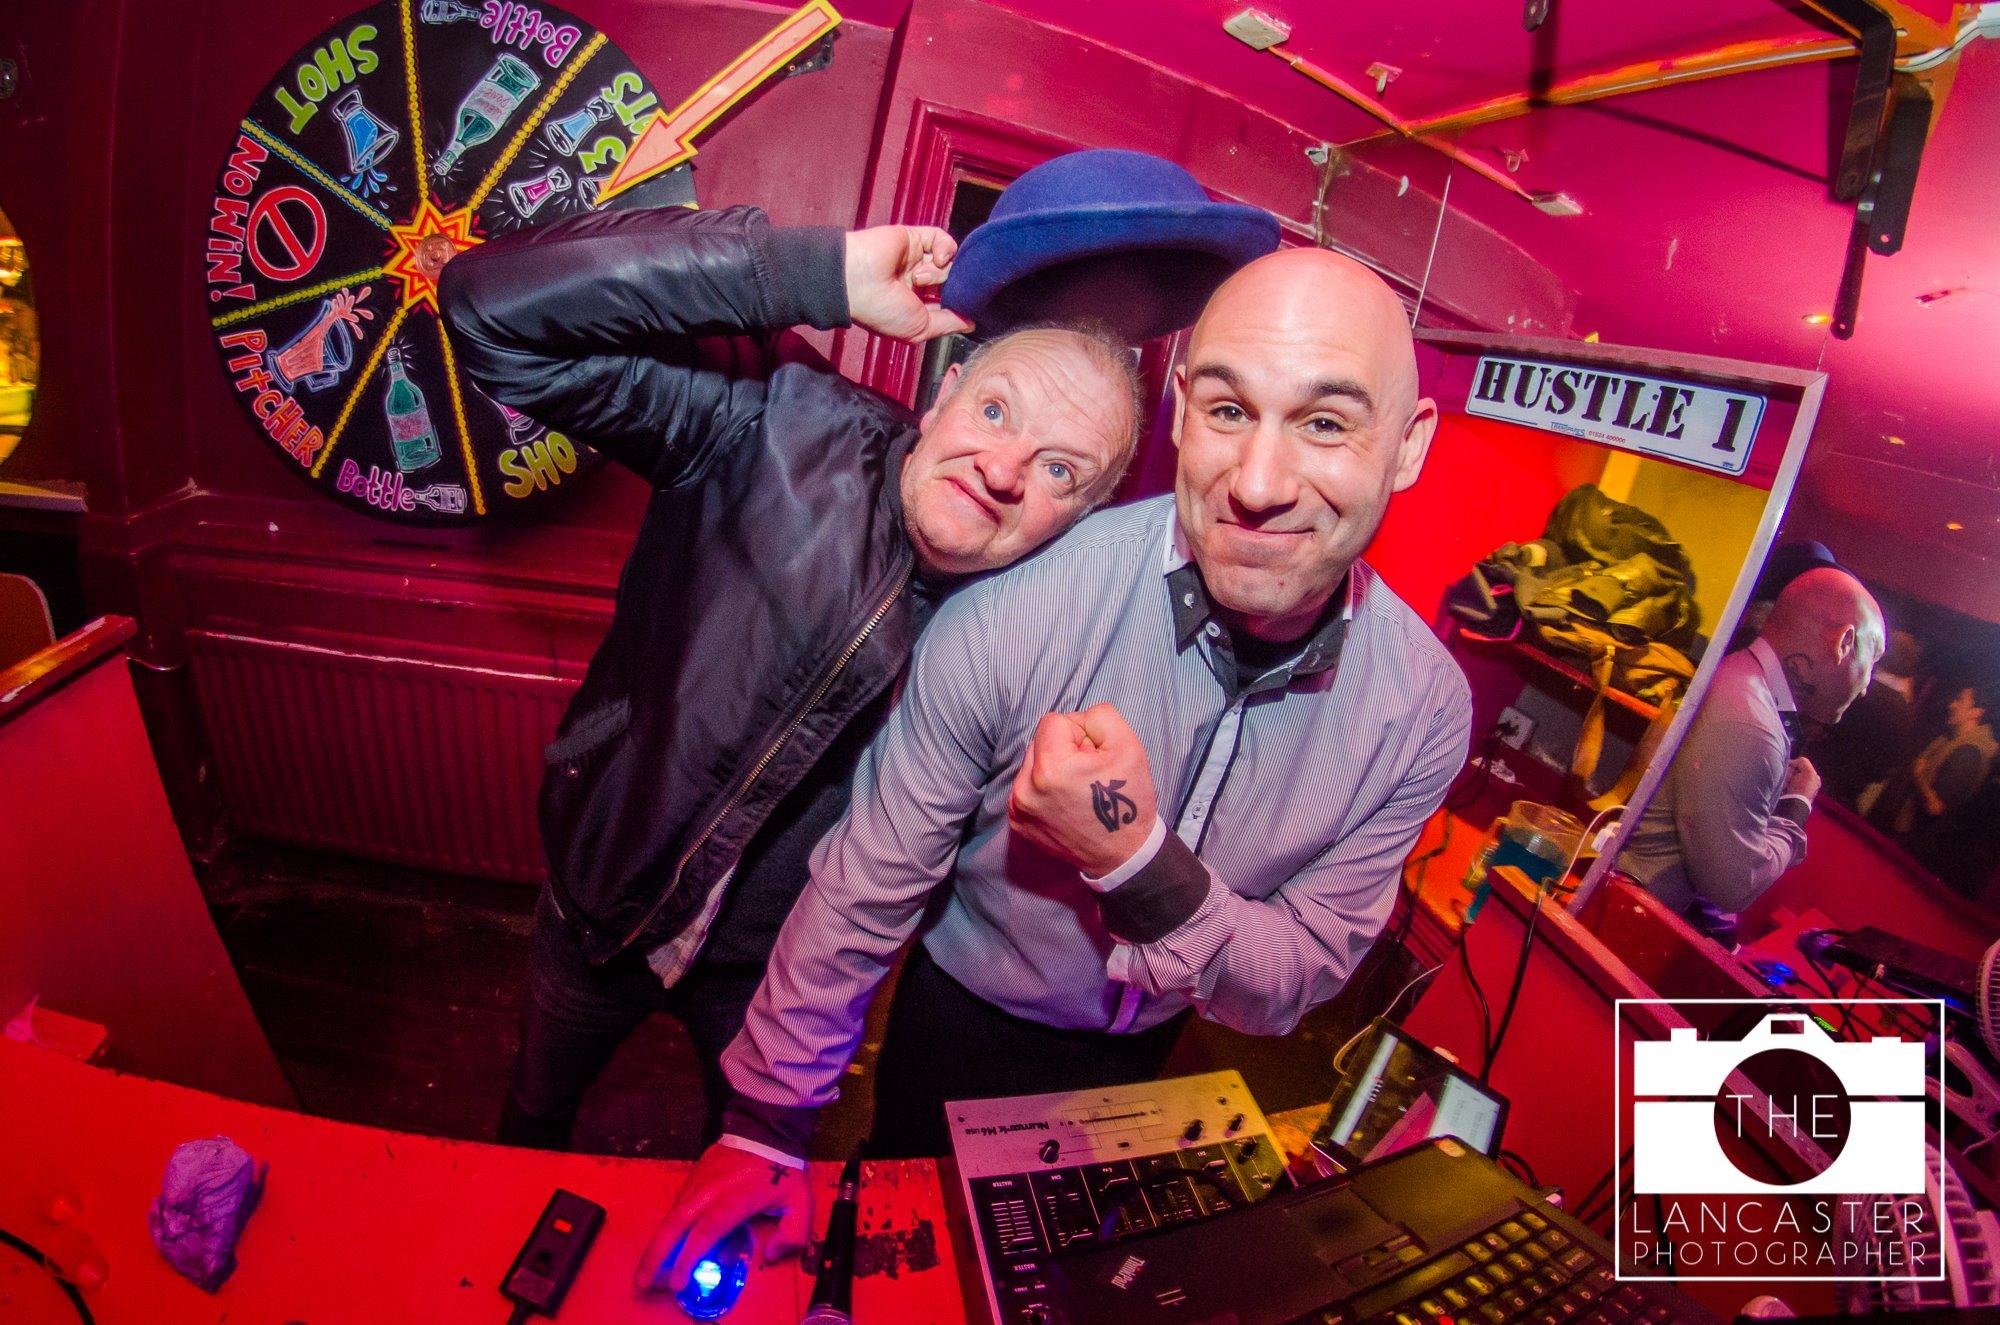 Hats off to DJ Wez